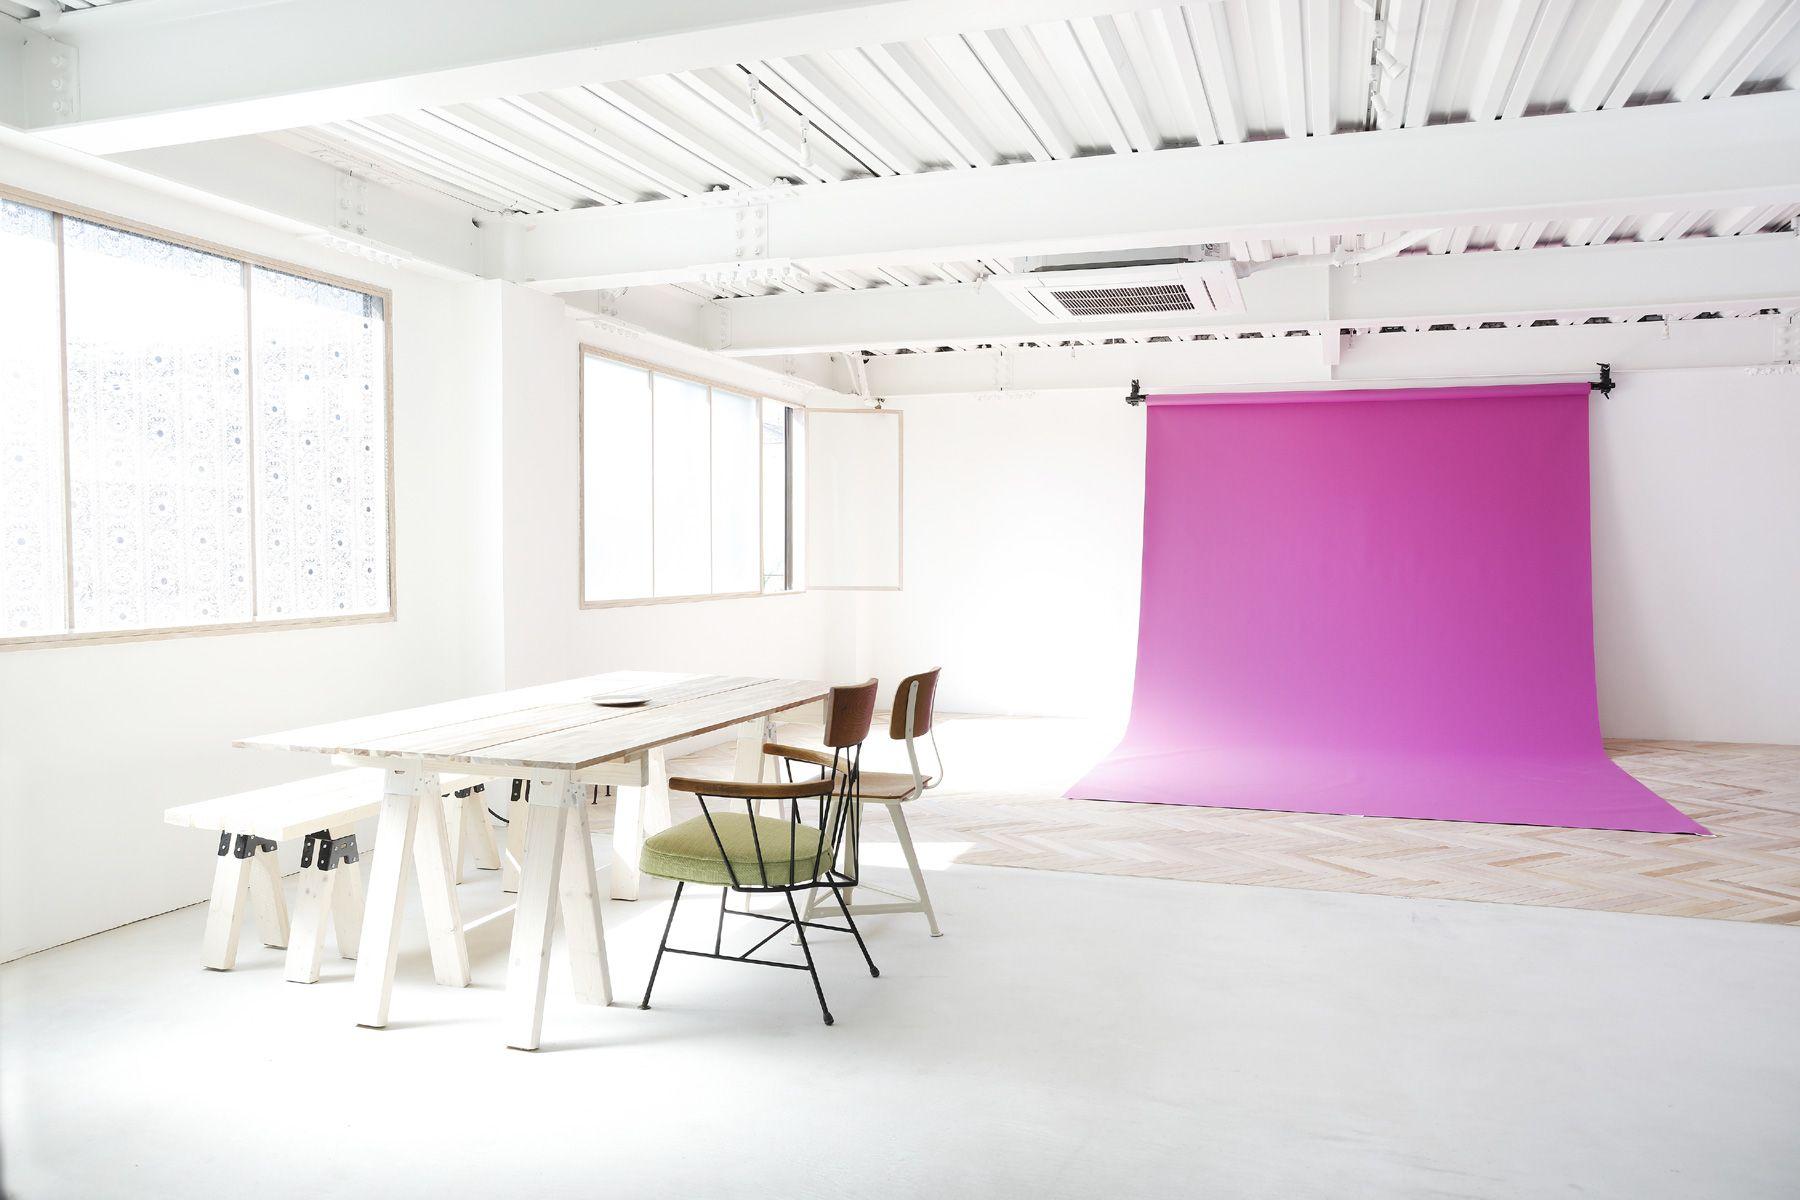 studio limll(スタジオ リムル)2F全体